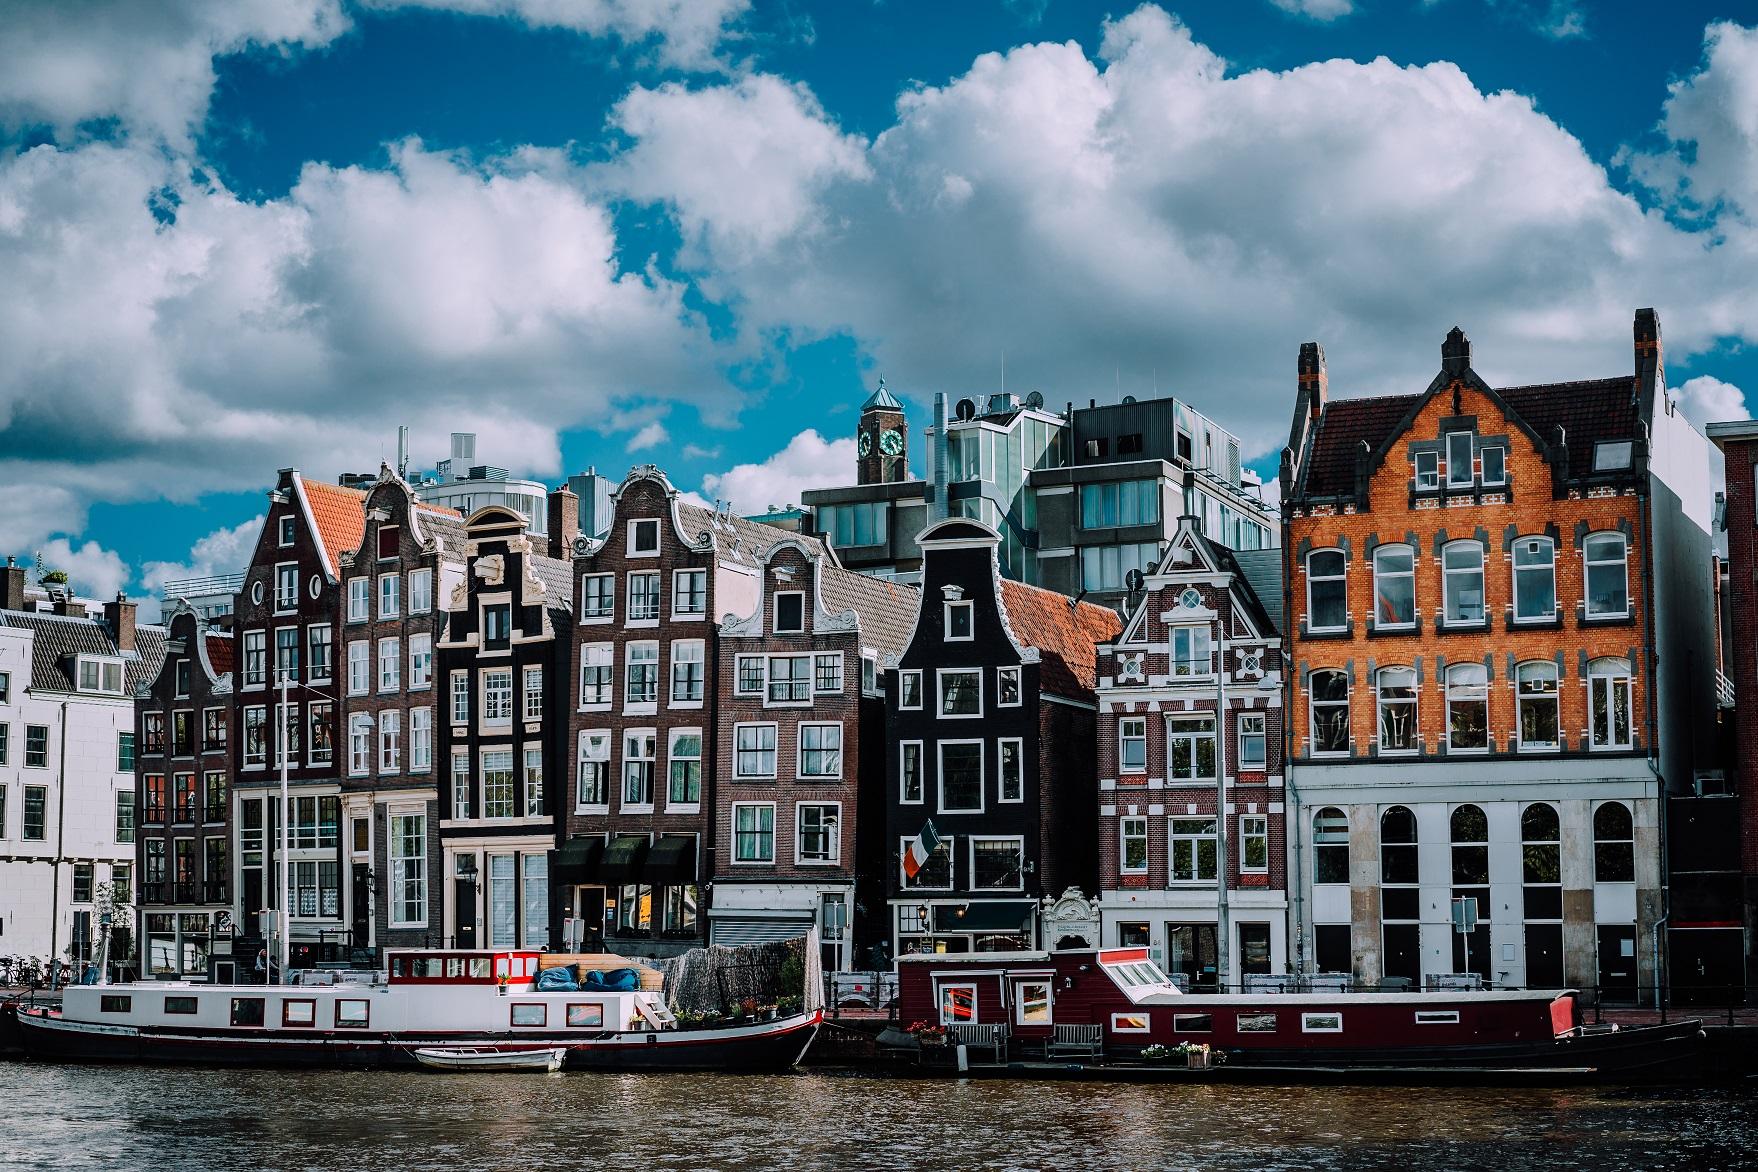 wonderful architecture of amsterdam white fluffy c 52RF47Y #новости Грузия-Нидерланды, Нидерланды